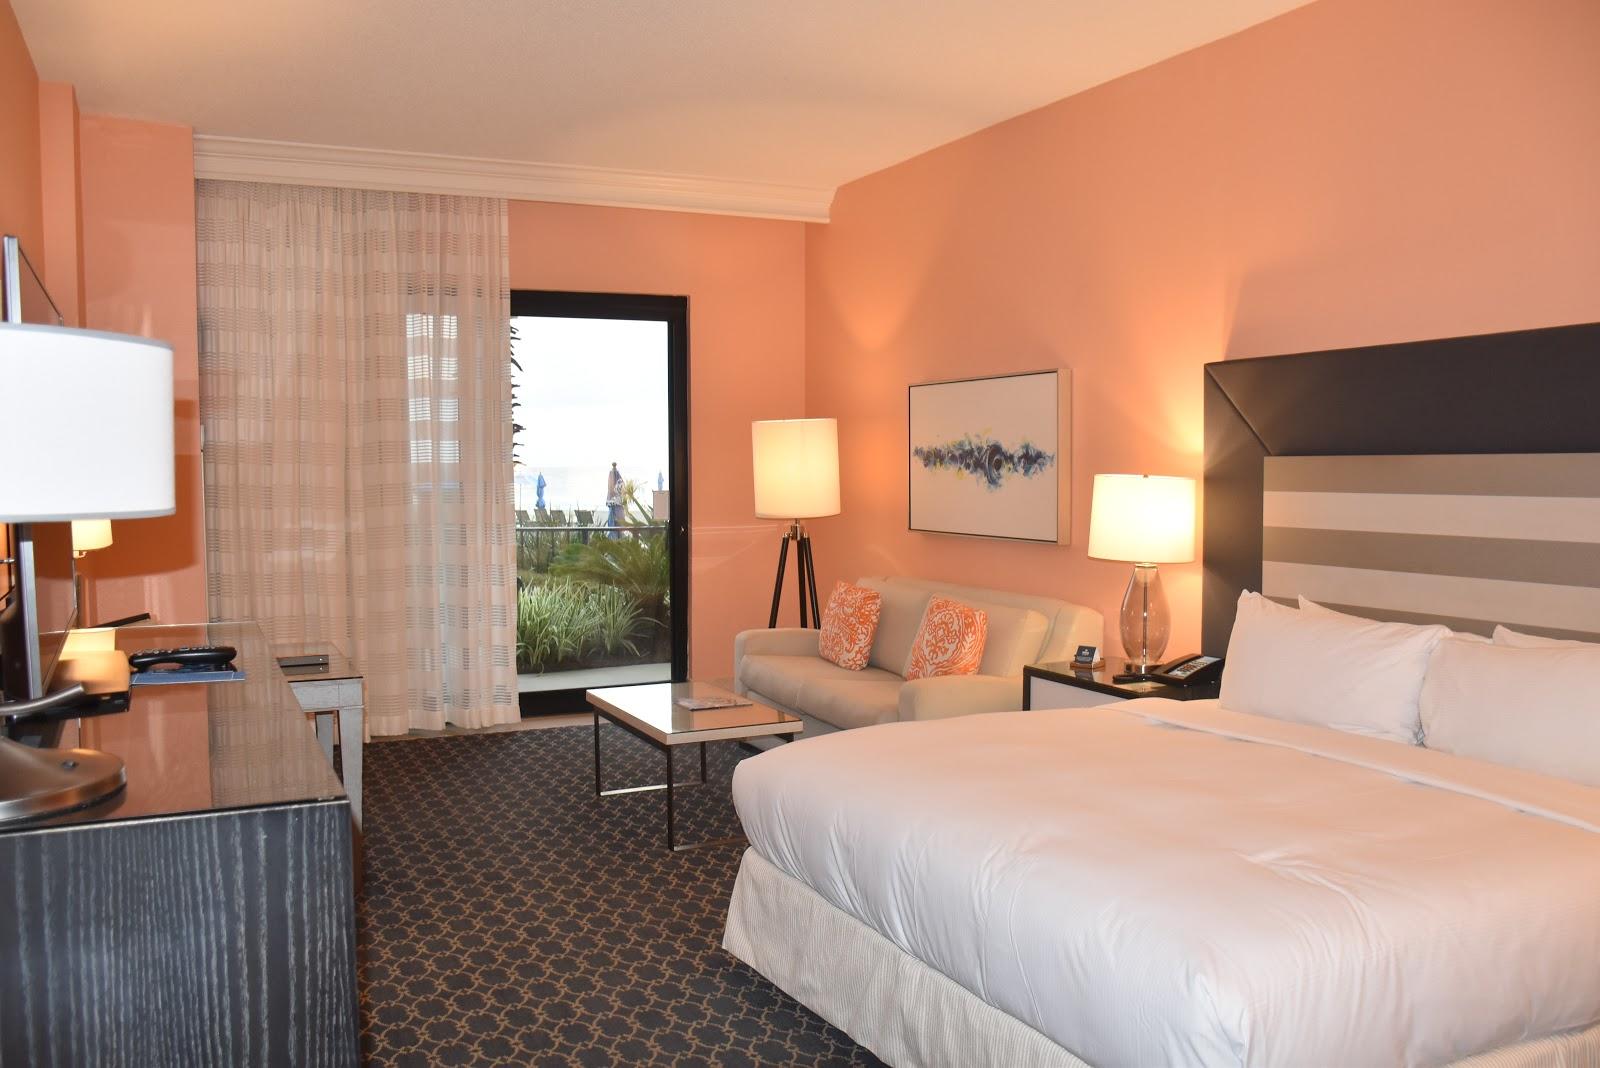 The Hilton Sandestin Resort